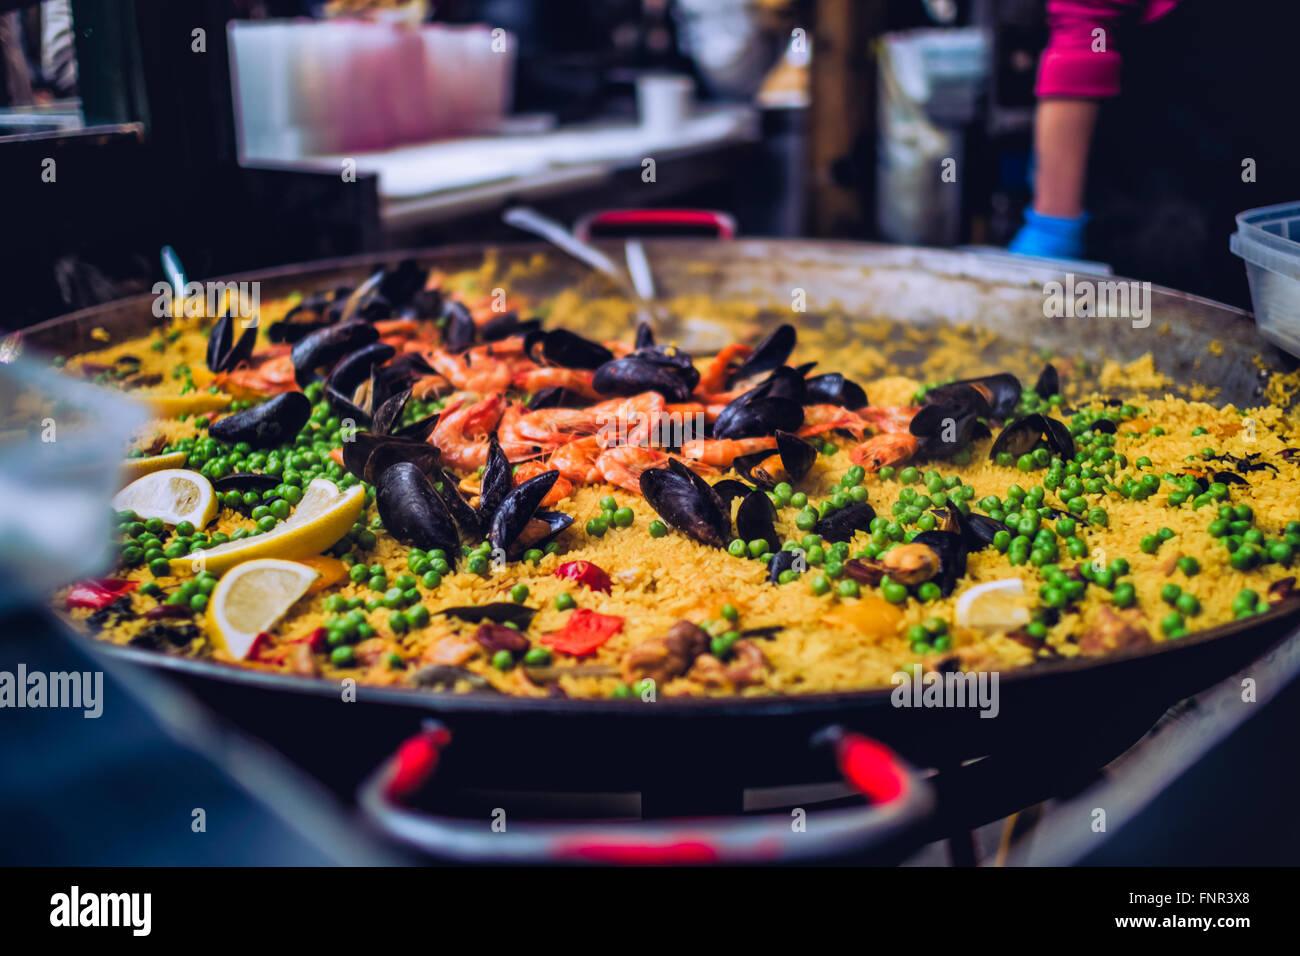 Paella at Borough Market - Stock Image